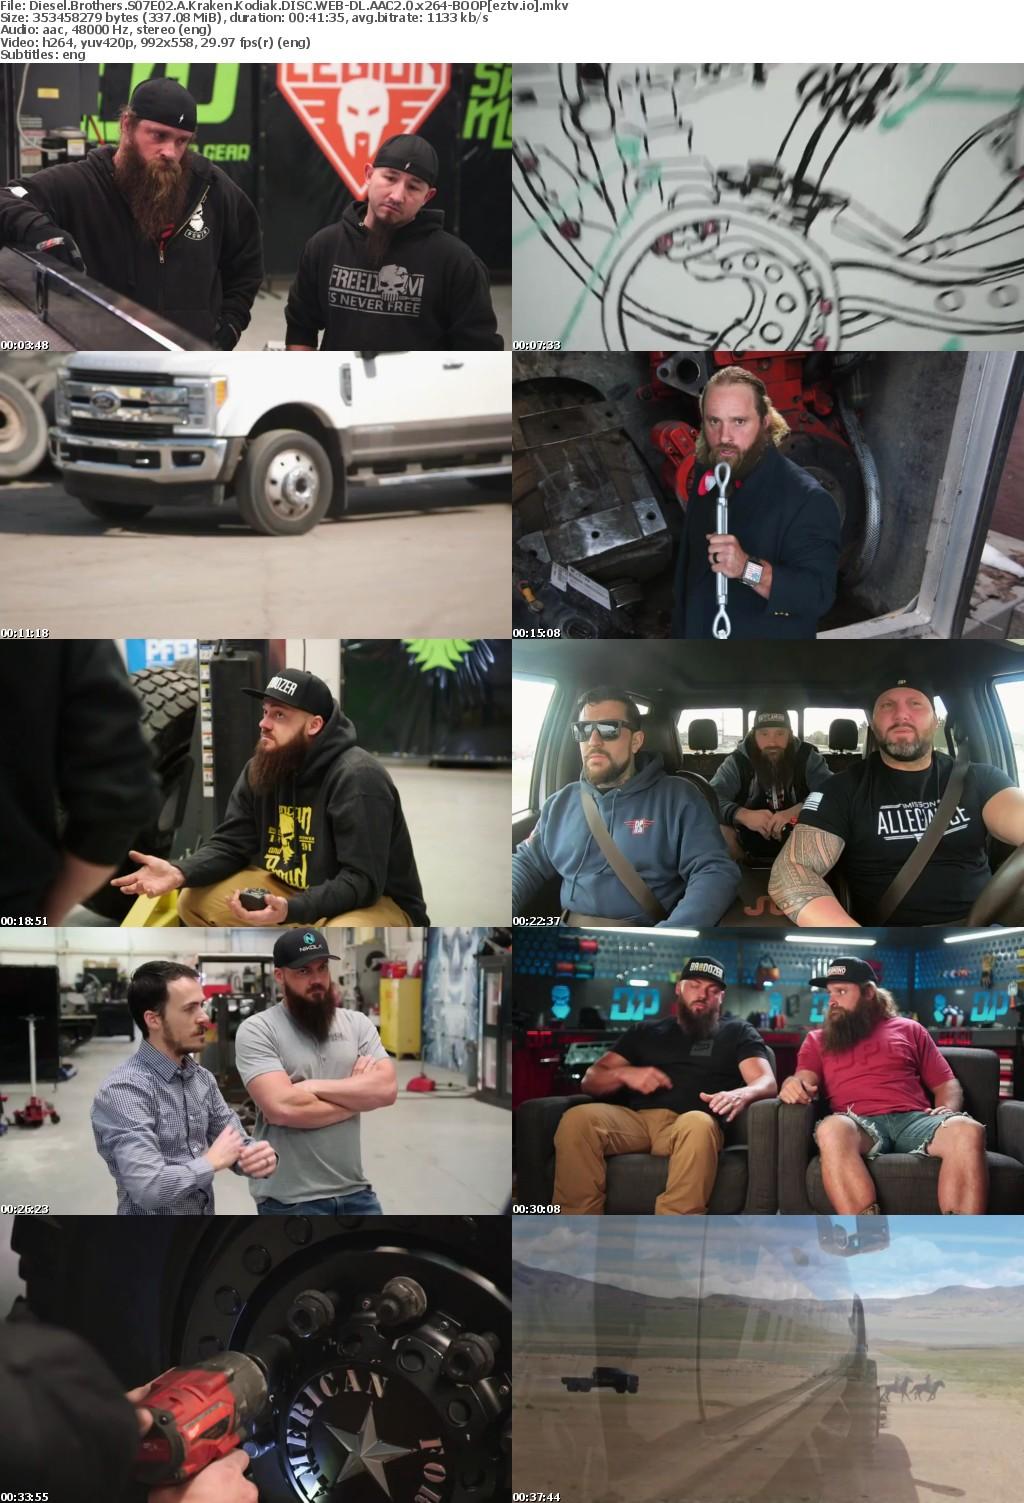 Diesel Brothers S07E02 A Kraken Kodiak DISC WEB-DL AAC2 0 x264-BOOP